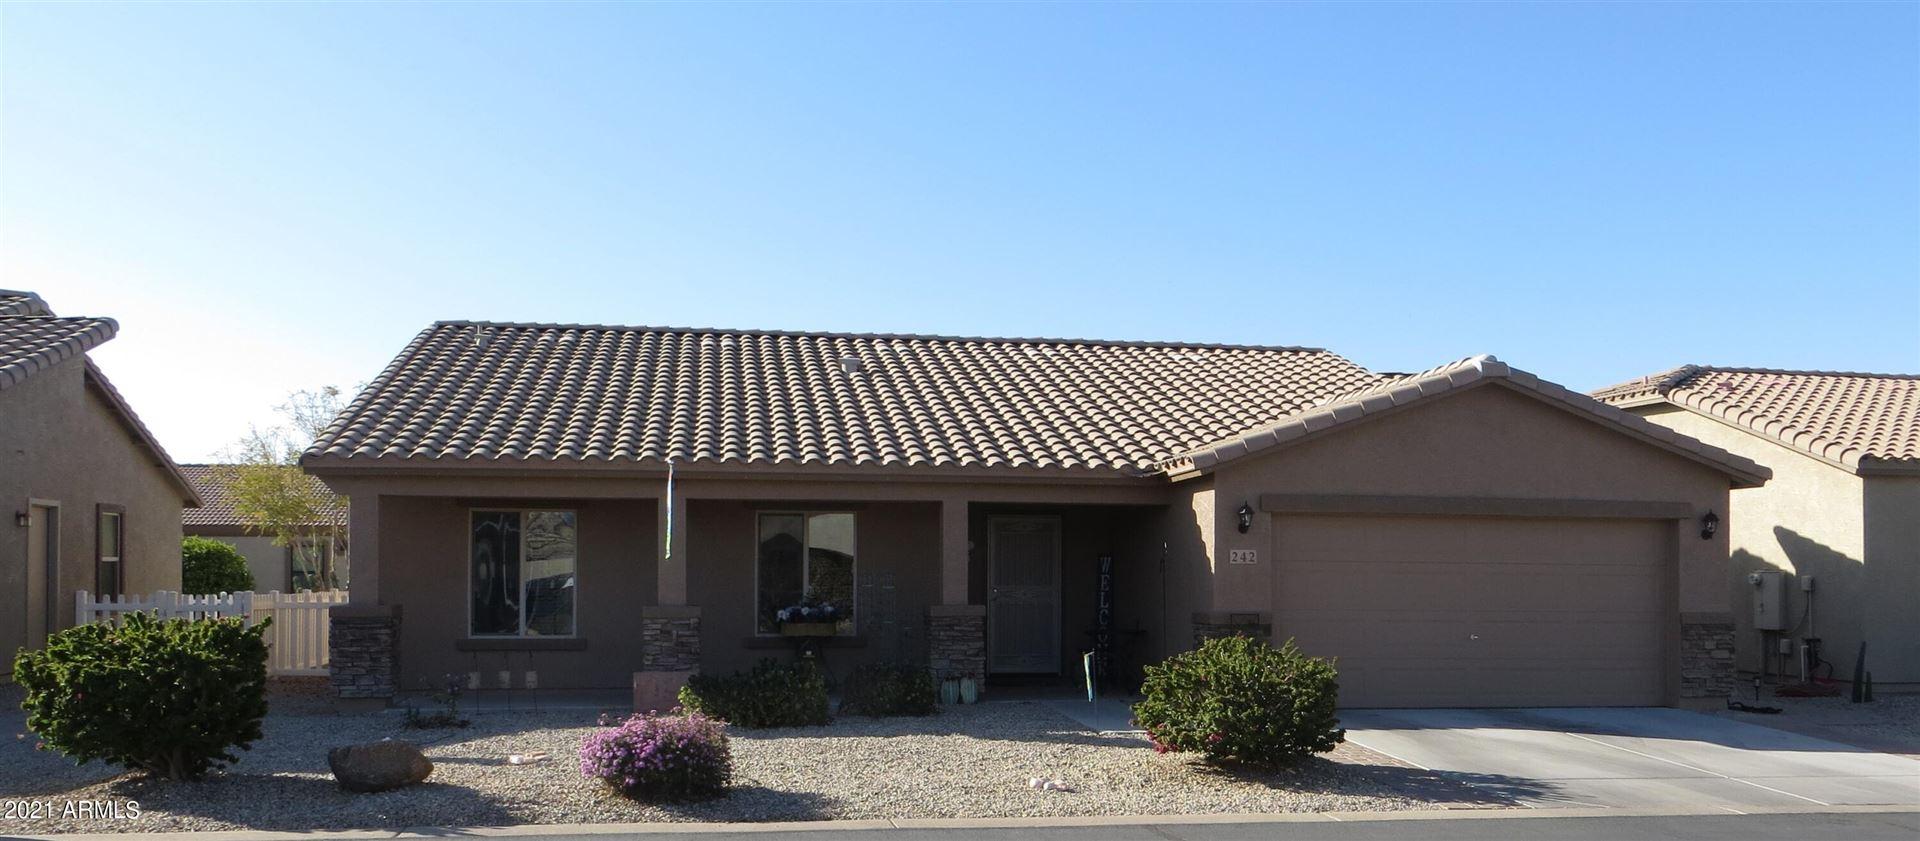 Photo of 2101 S MERIDIAN Road #242, Apache Junction, AZ 85120 (MLS # 6202176)